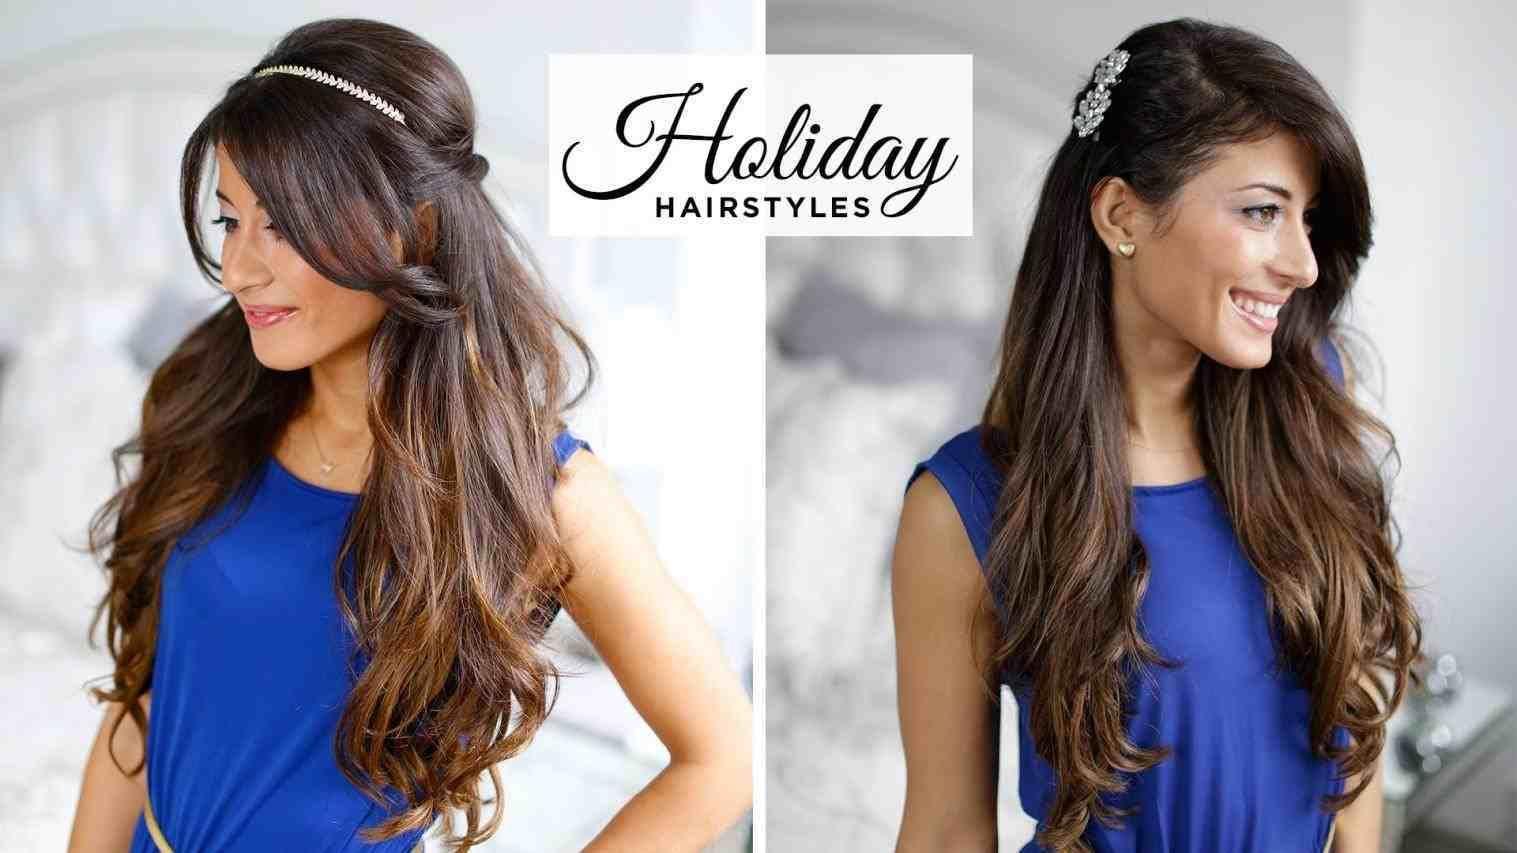 Pin By Joanna Keysa On Hairstyles Hair Styles Long Hair Styles Hair